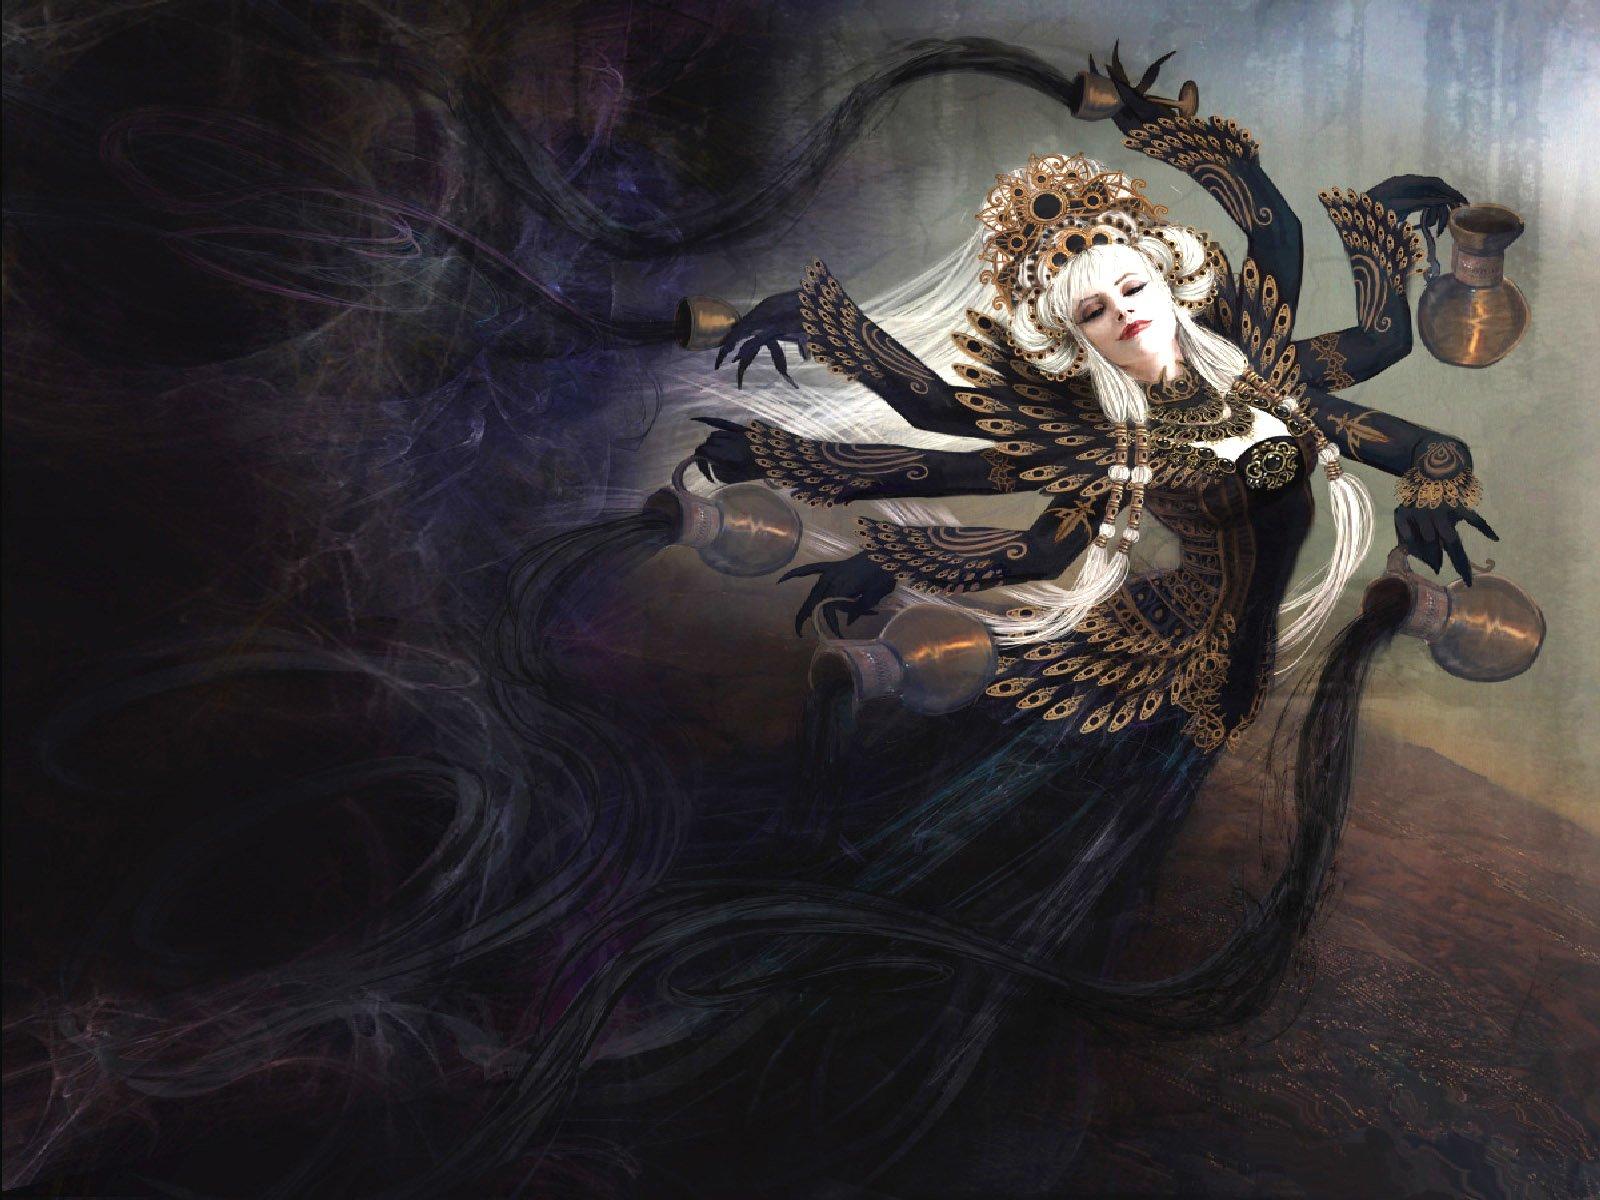 Fantasia - Escuridão  Fantasia Woman Papel de Parede